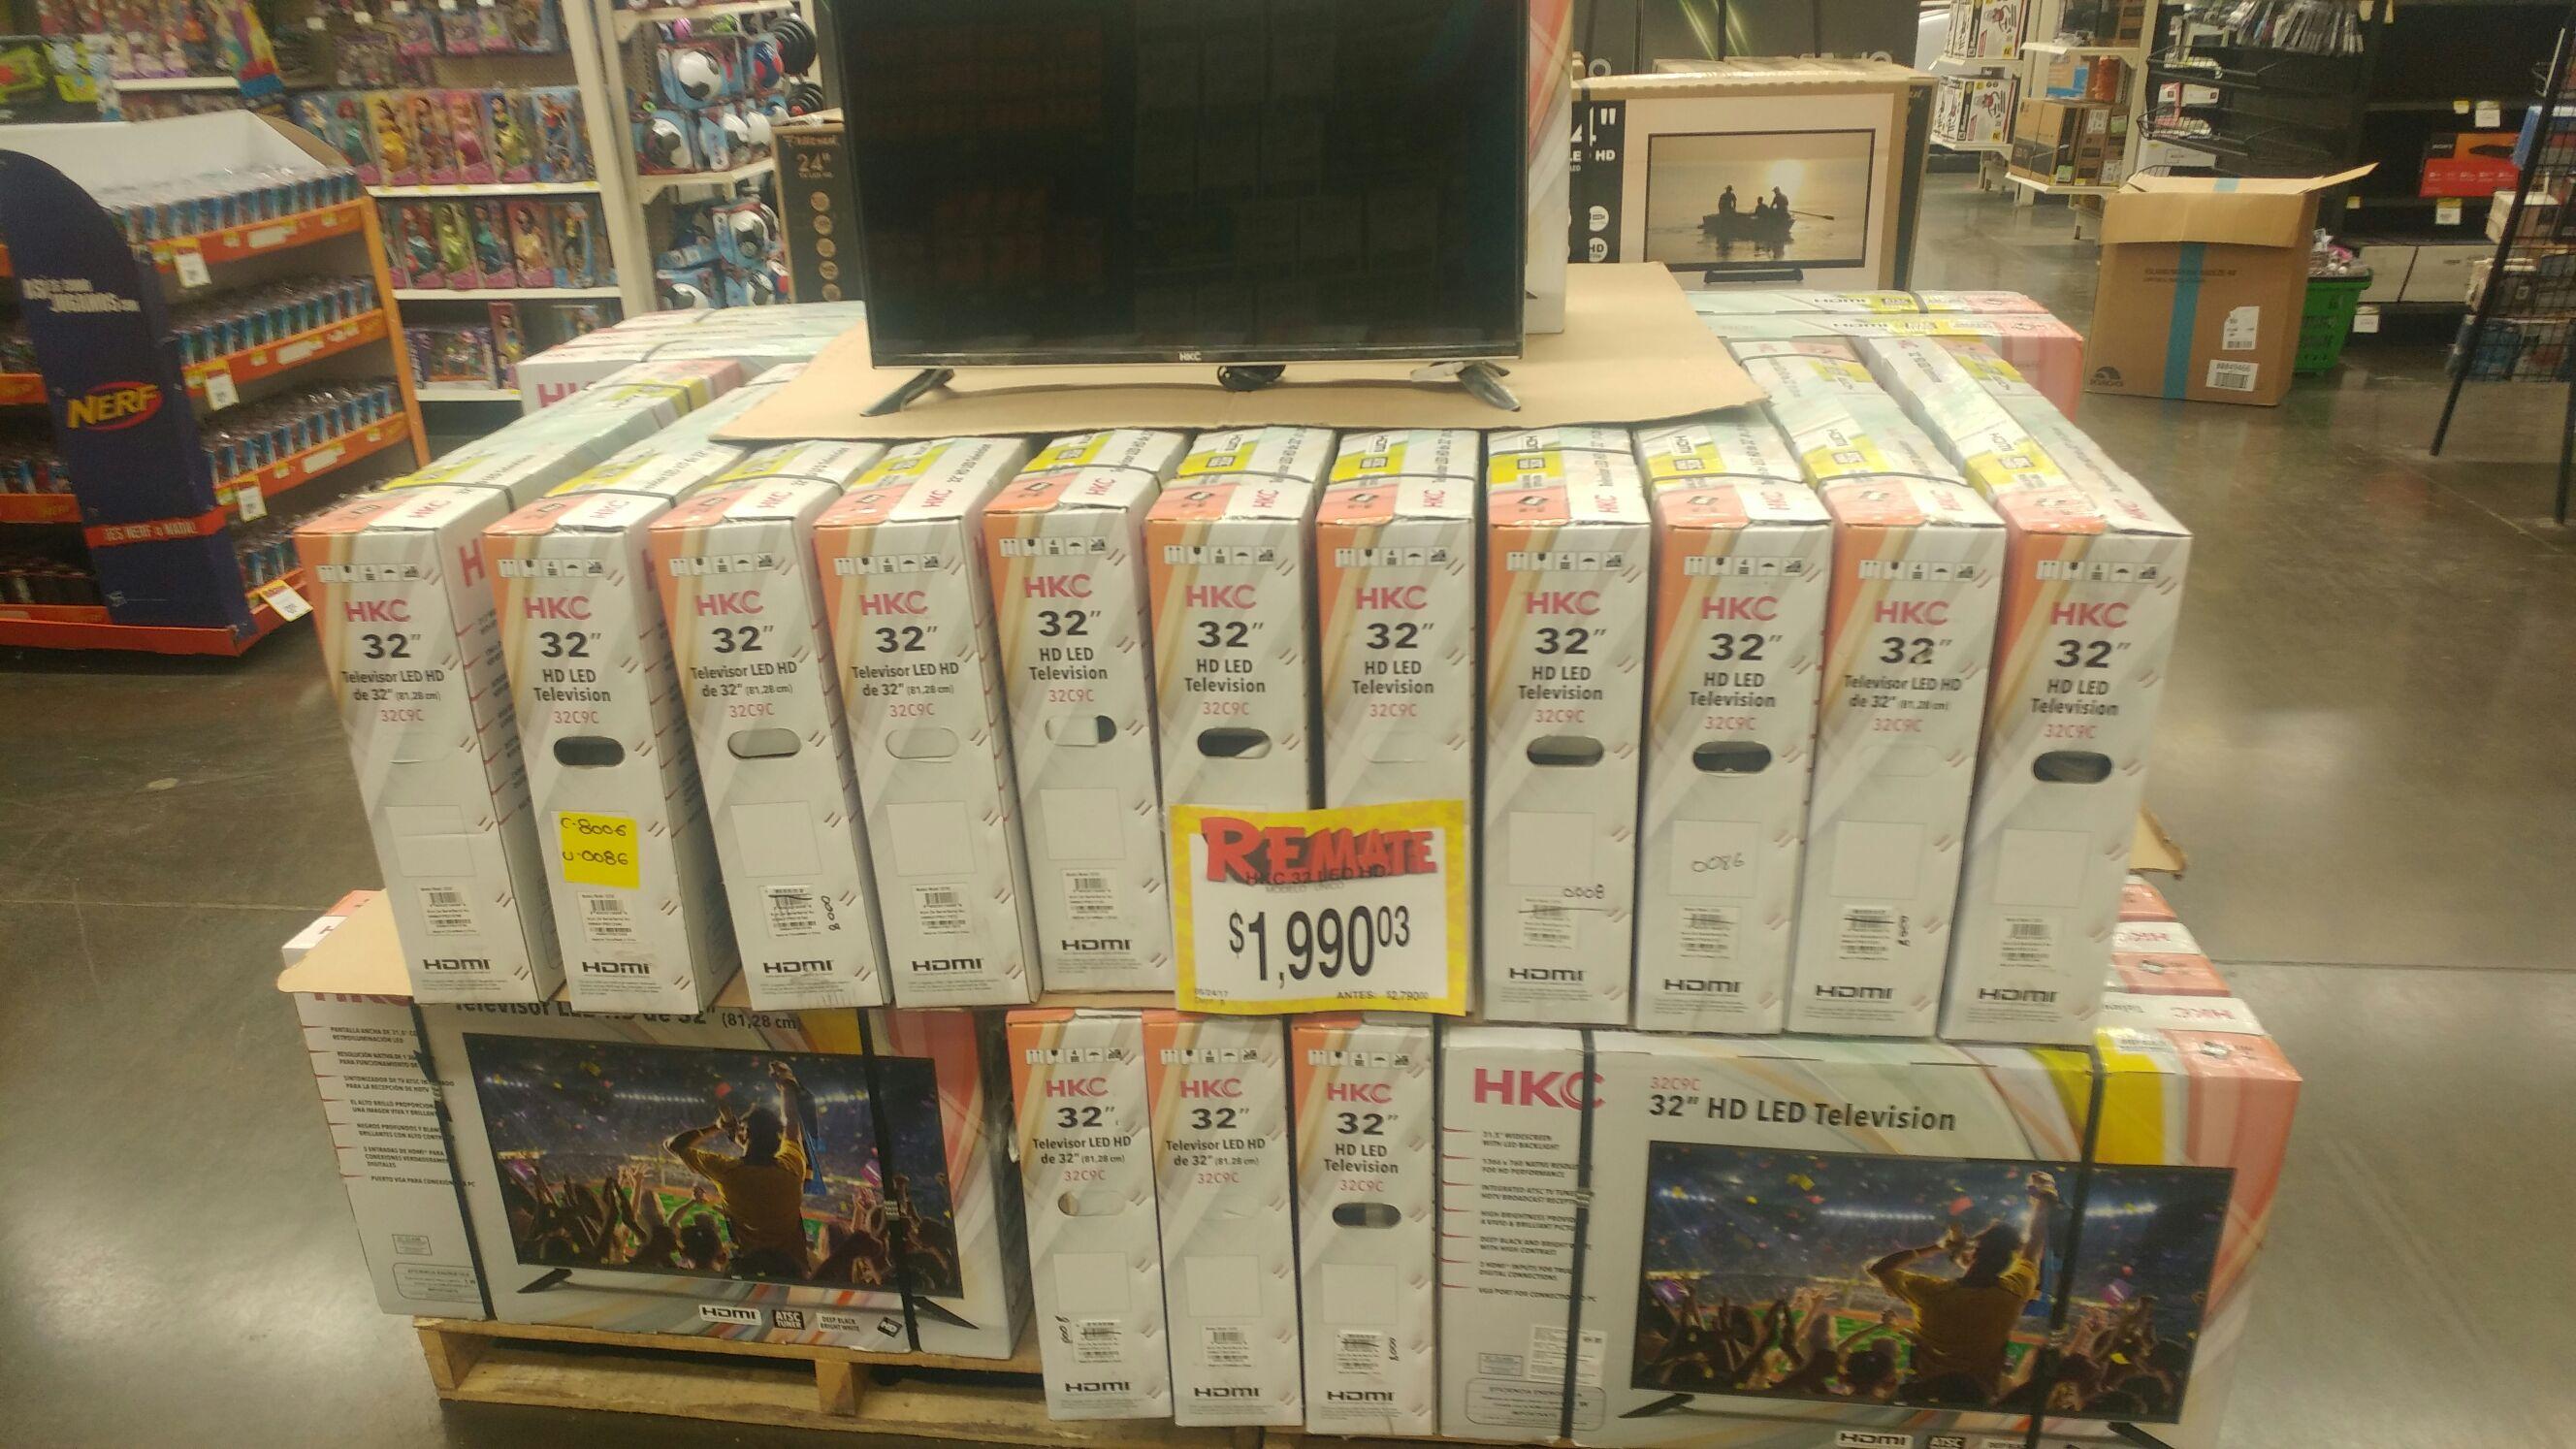 Bodega Aurrerá: television HKC 32 LED a $1,990.03